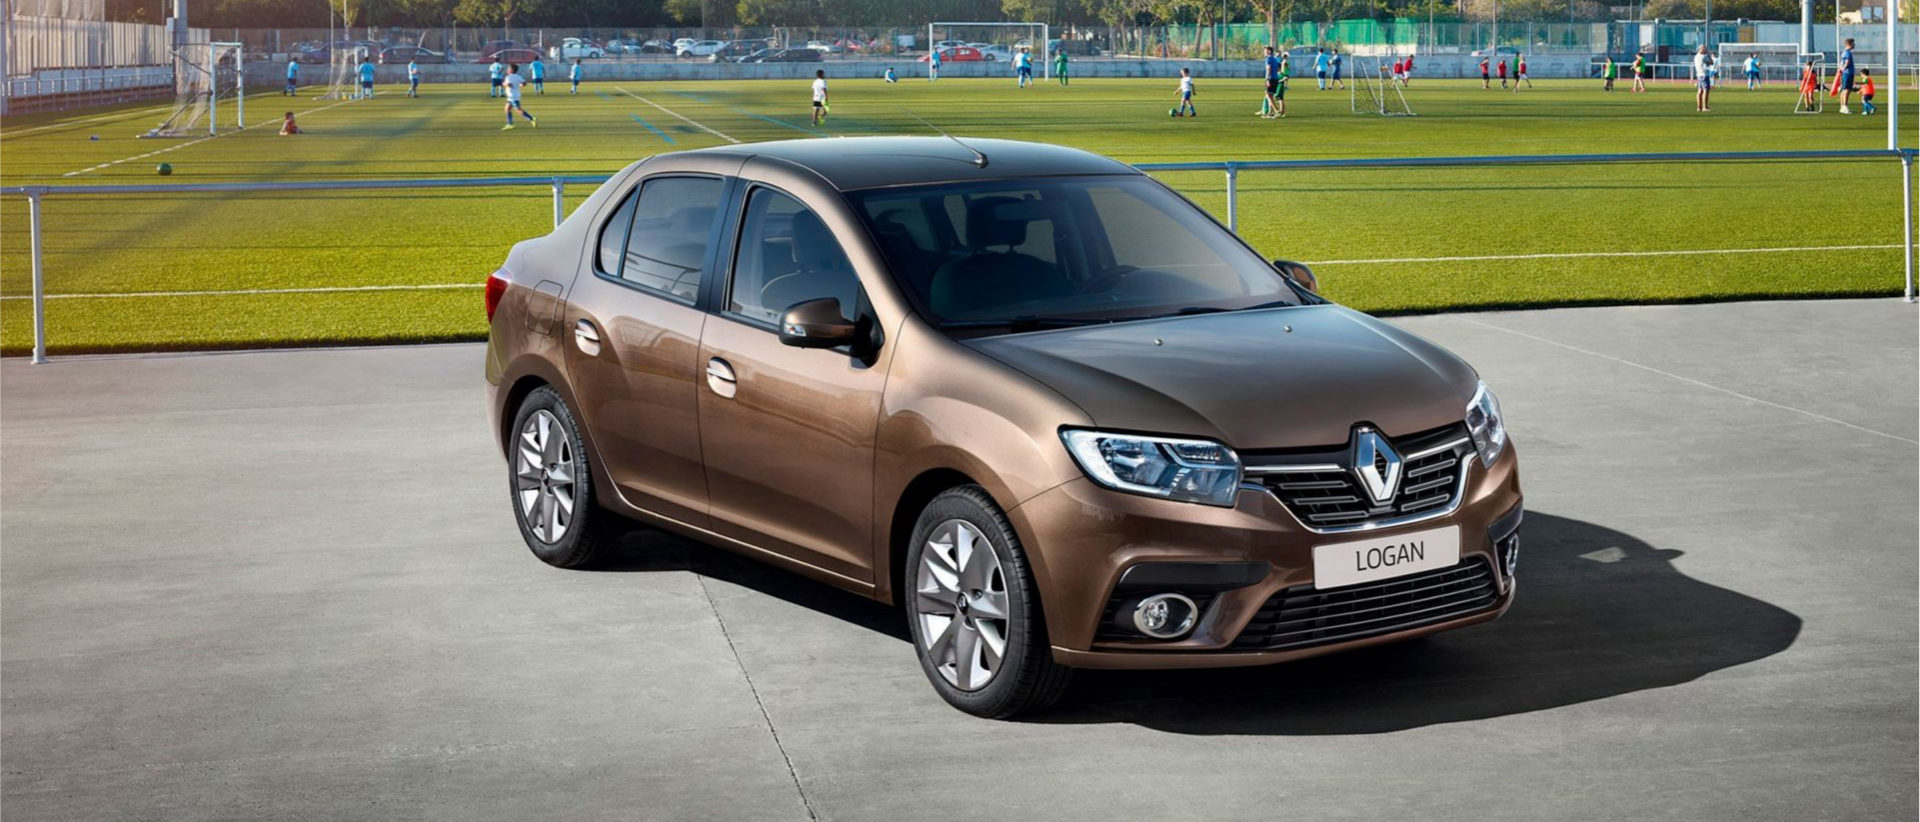 Renault LOGAN (салон) фото 3